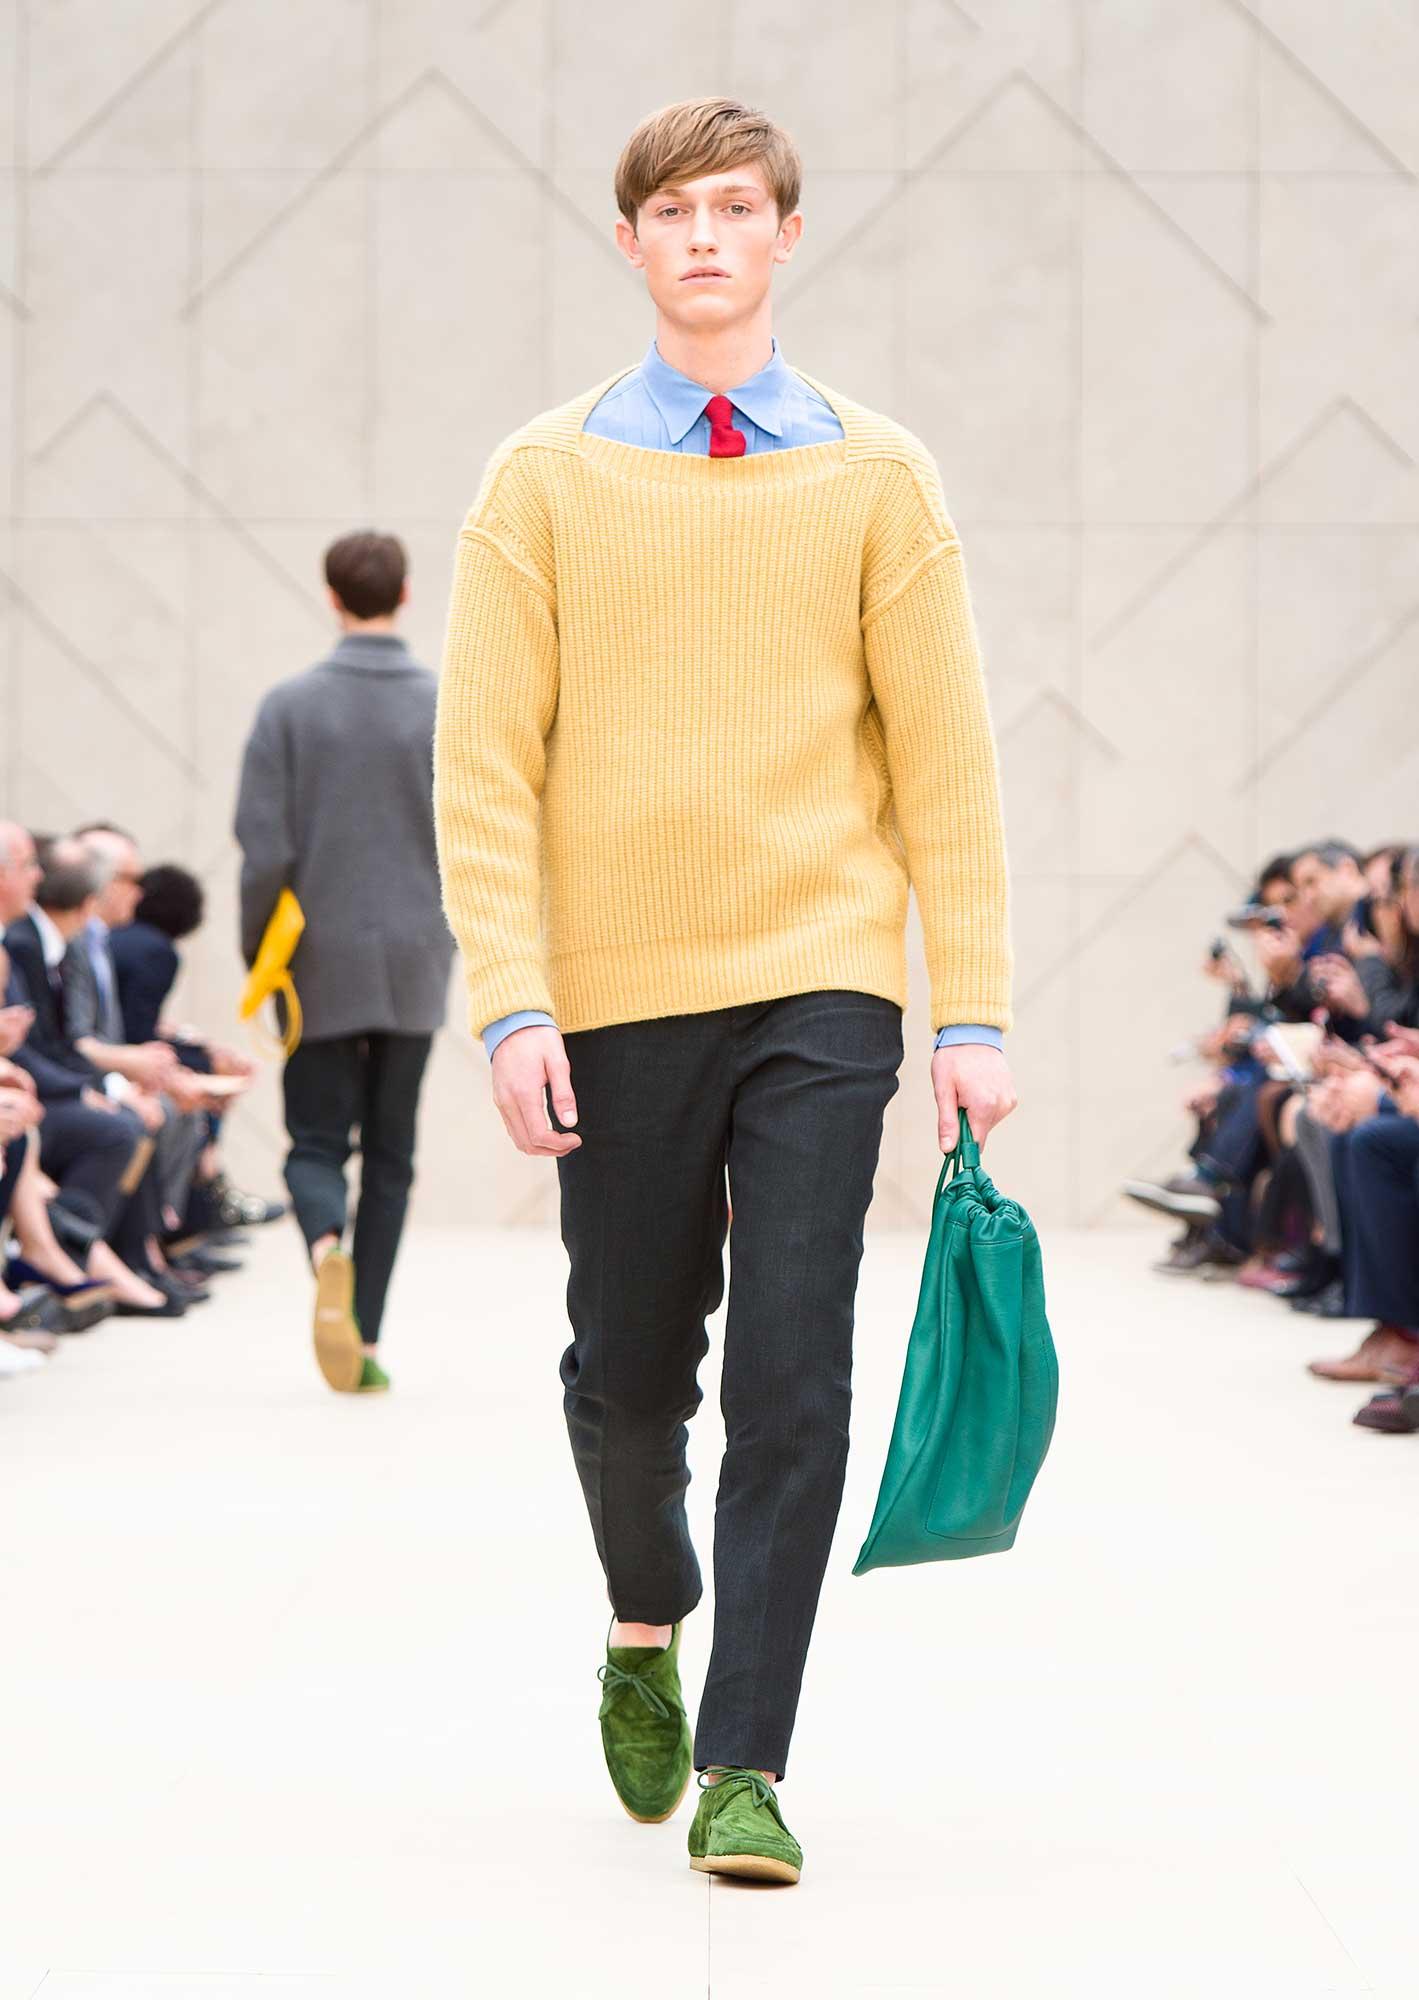 Burberry-Prorsum-Menswear-Spring-Summer-2014-Show---Look-5